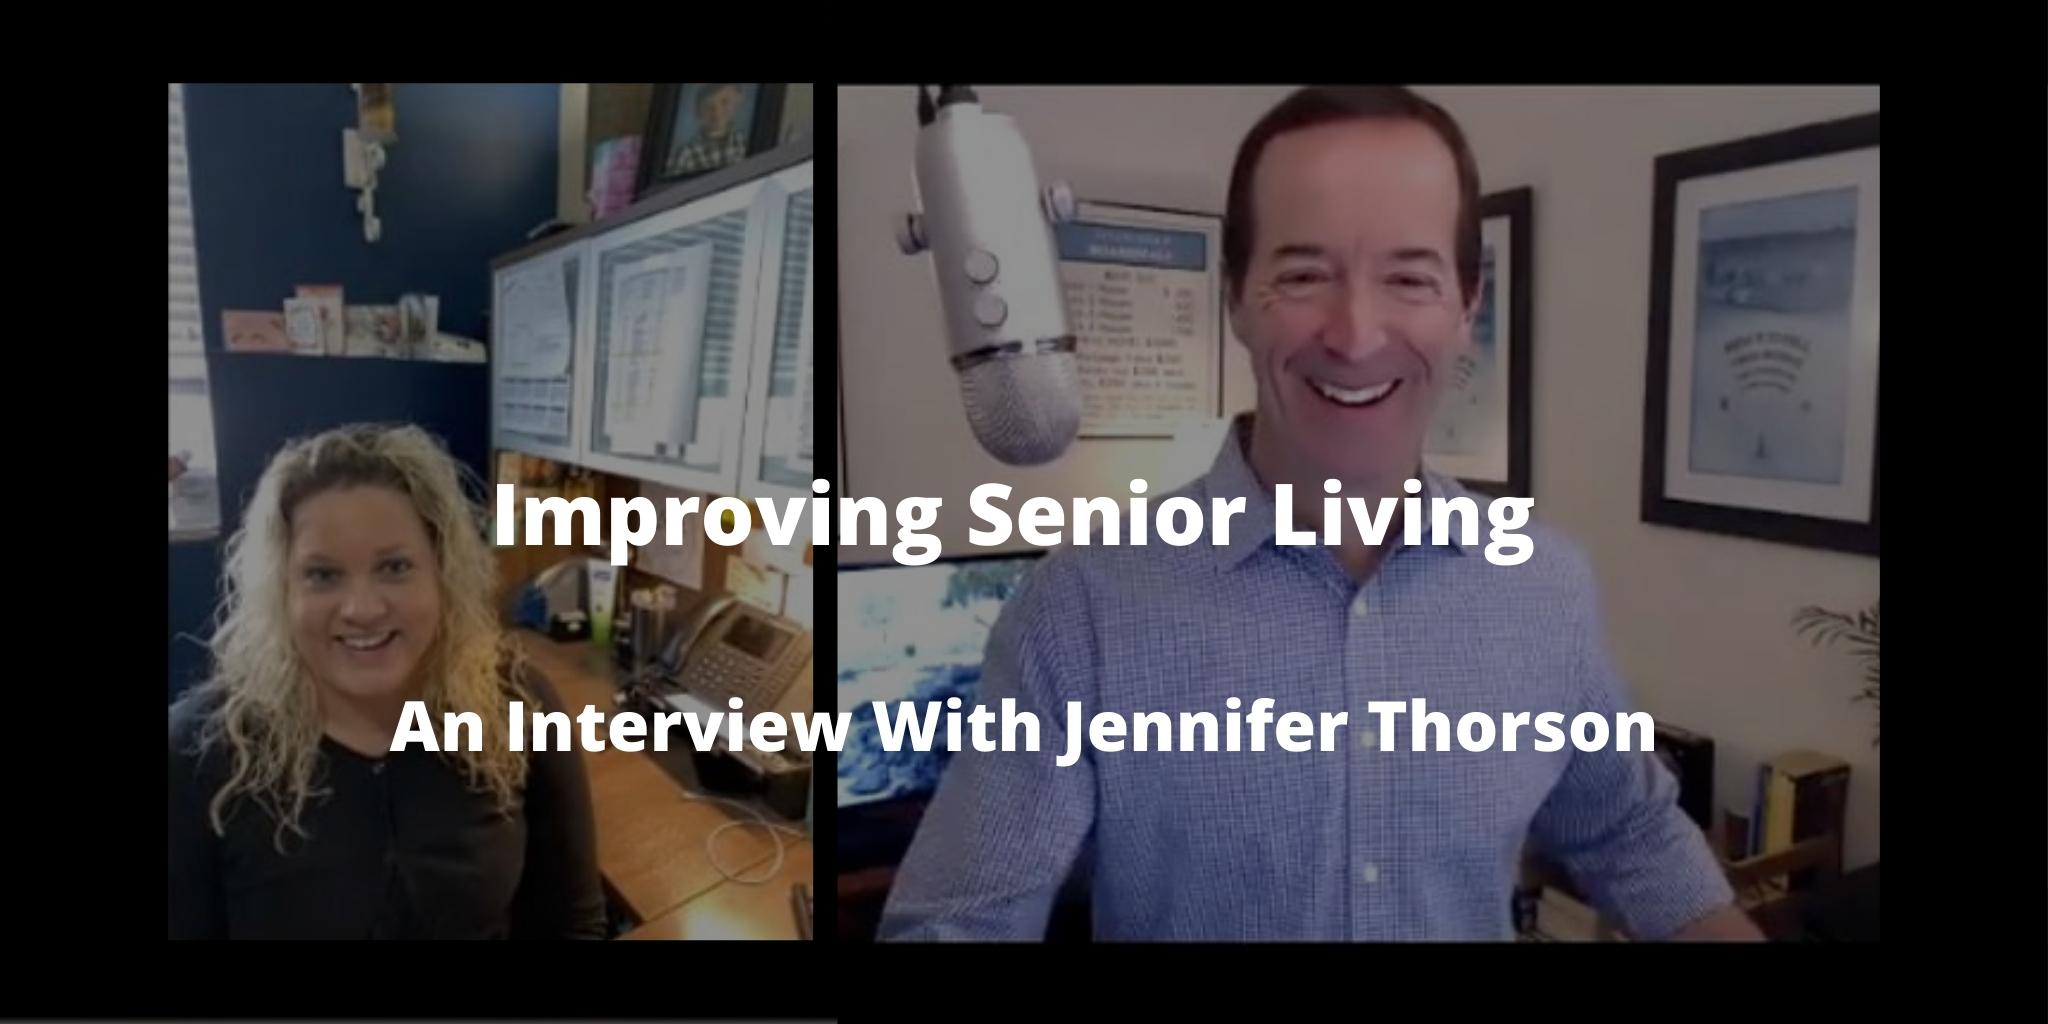 Improving Senior Living: An Interview With Jennifer Thorson